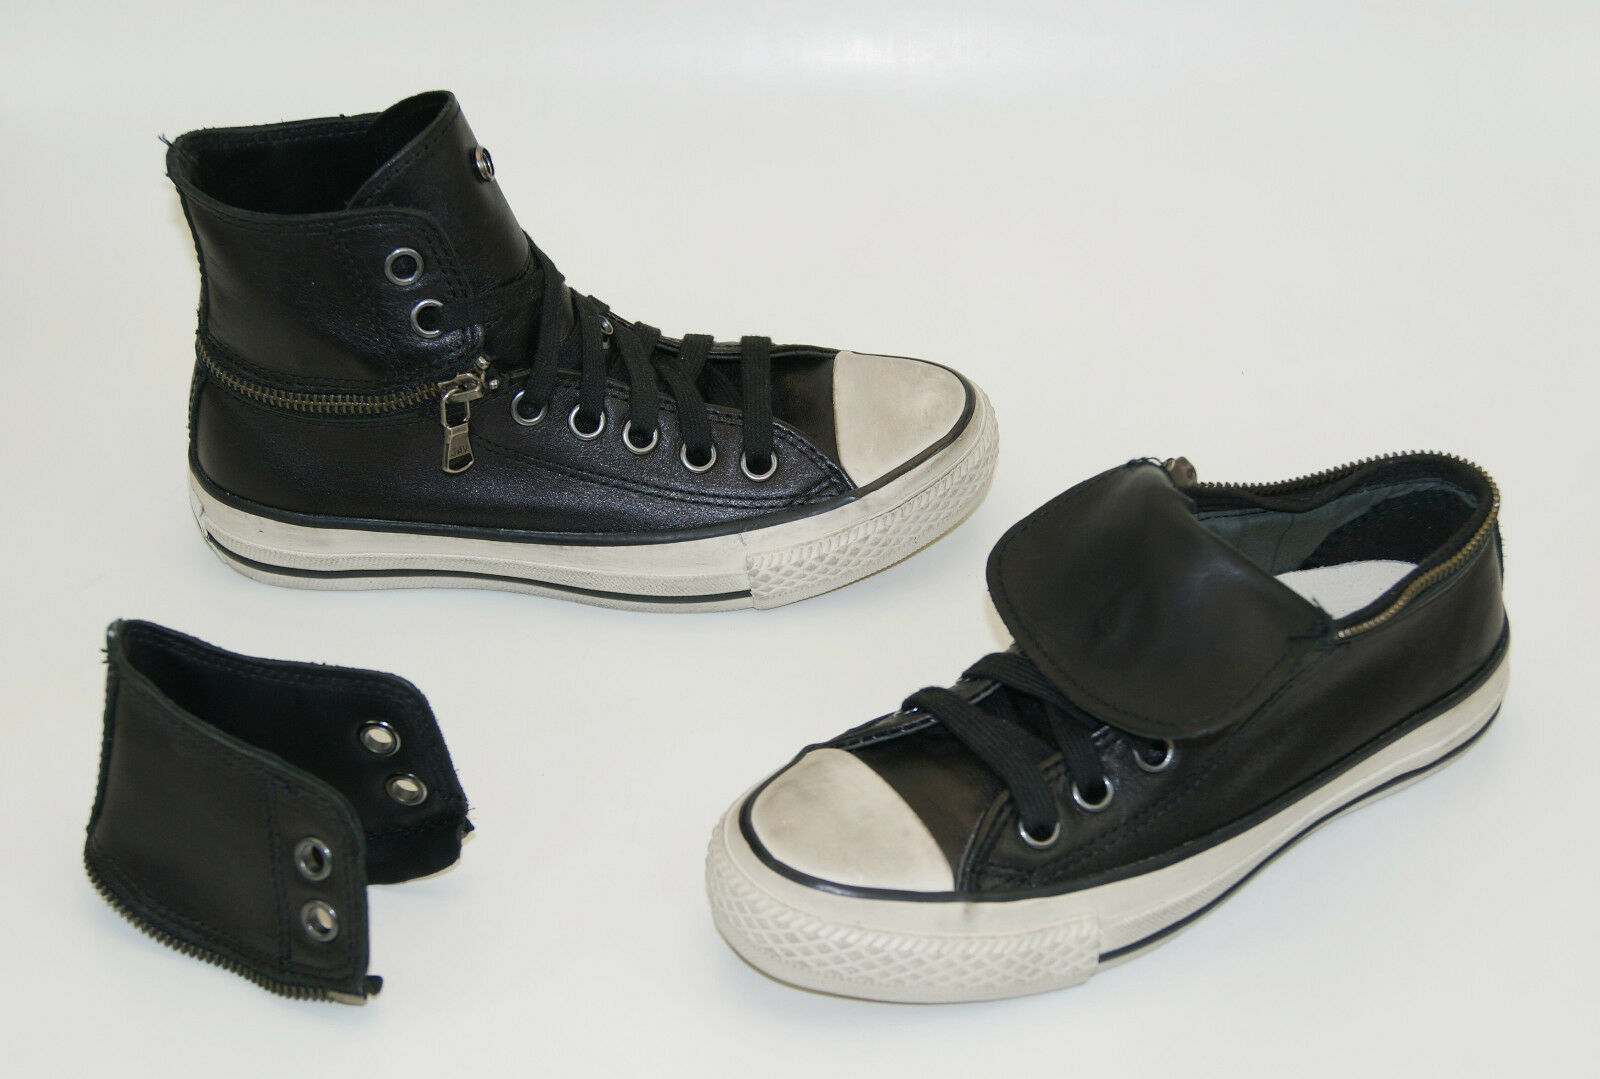 Converse John Varvatos Zip Hi Boots Size 35 US 5 Sneakers Chucks Limited Edition